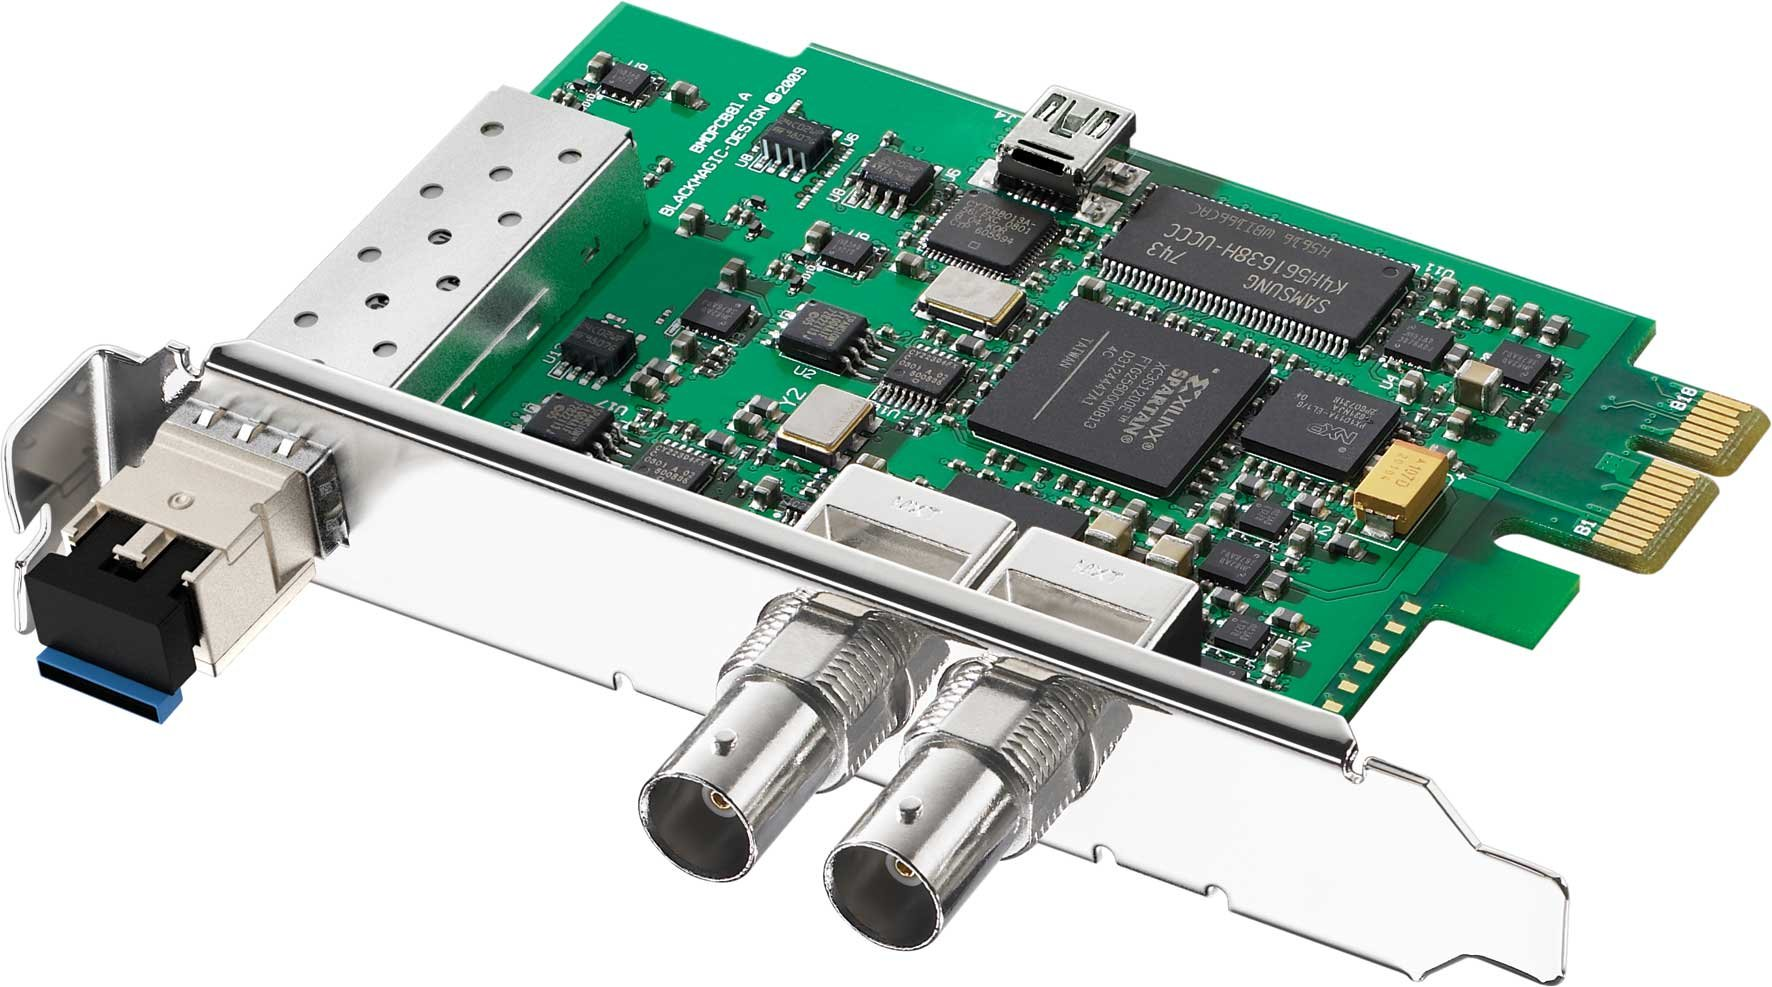 3G-SDI and Optical Fiber Scope